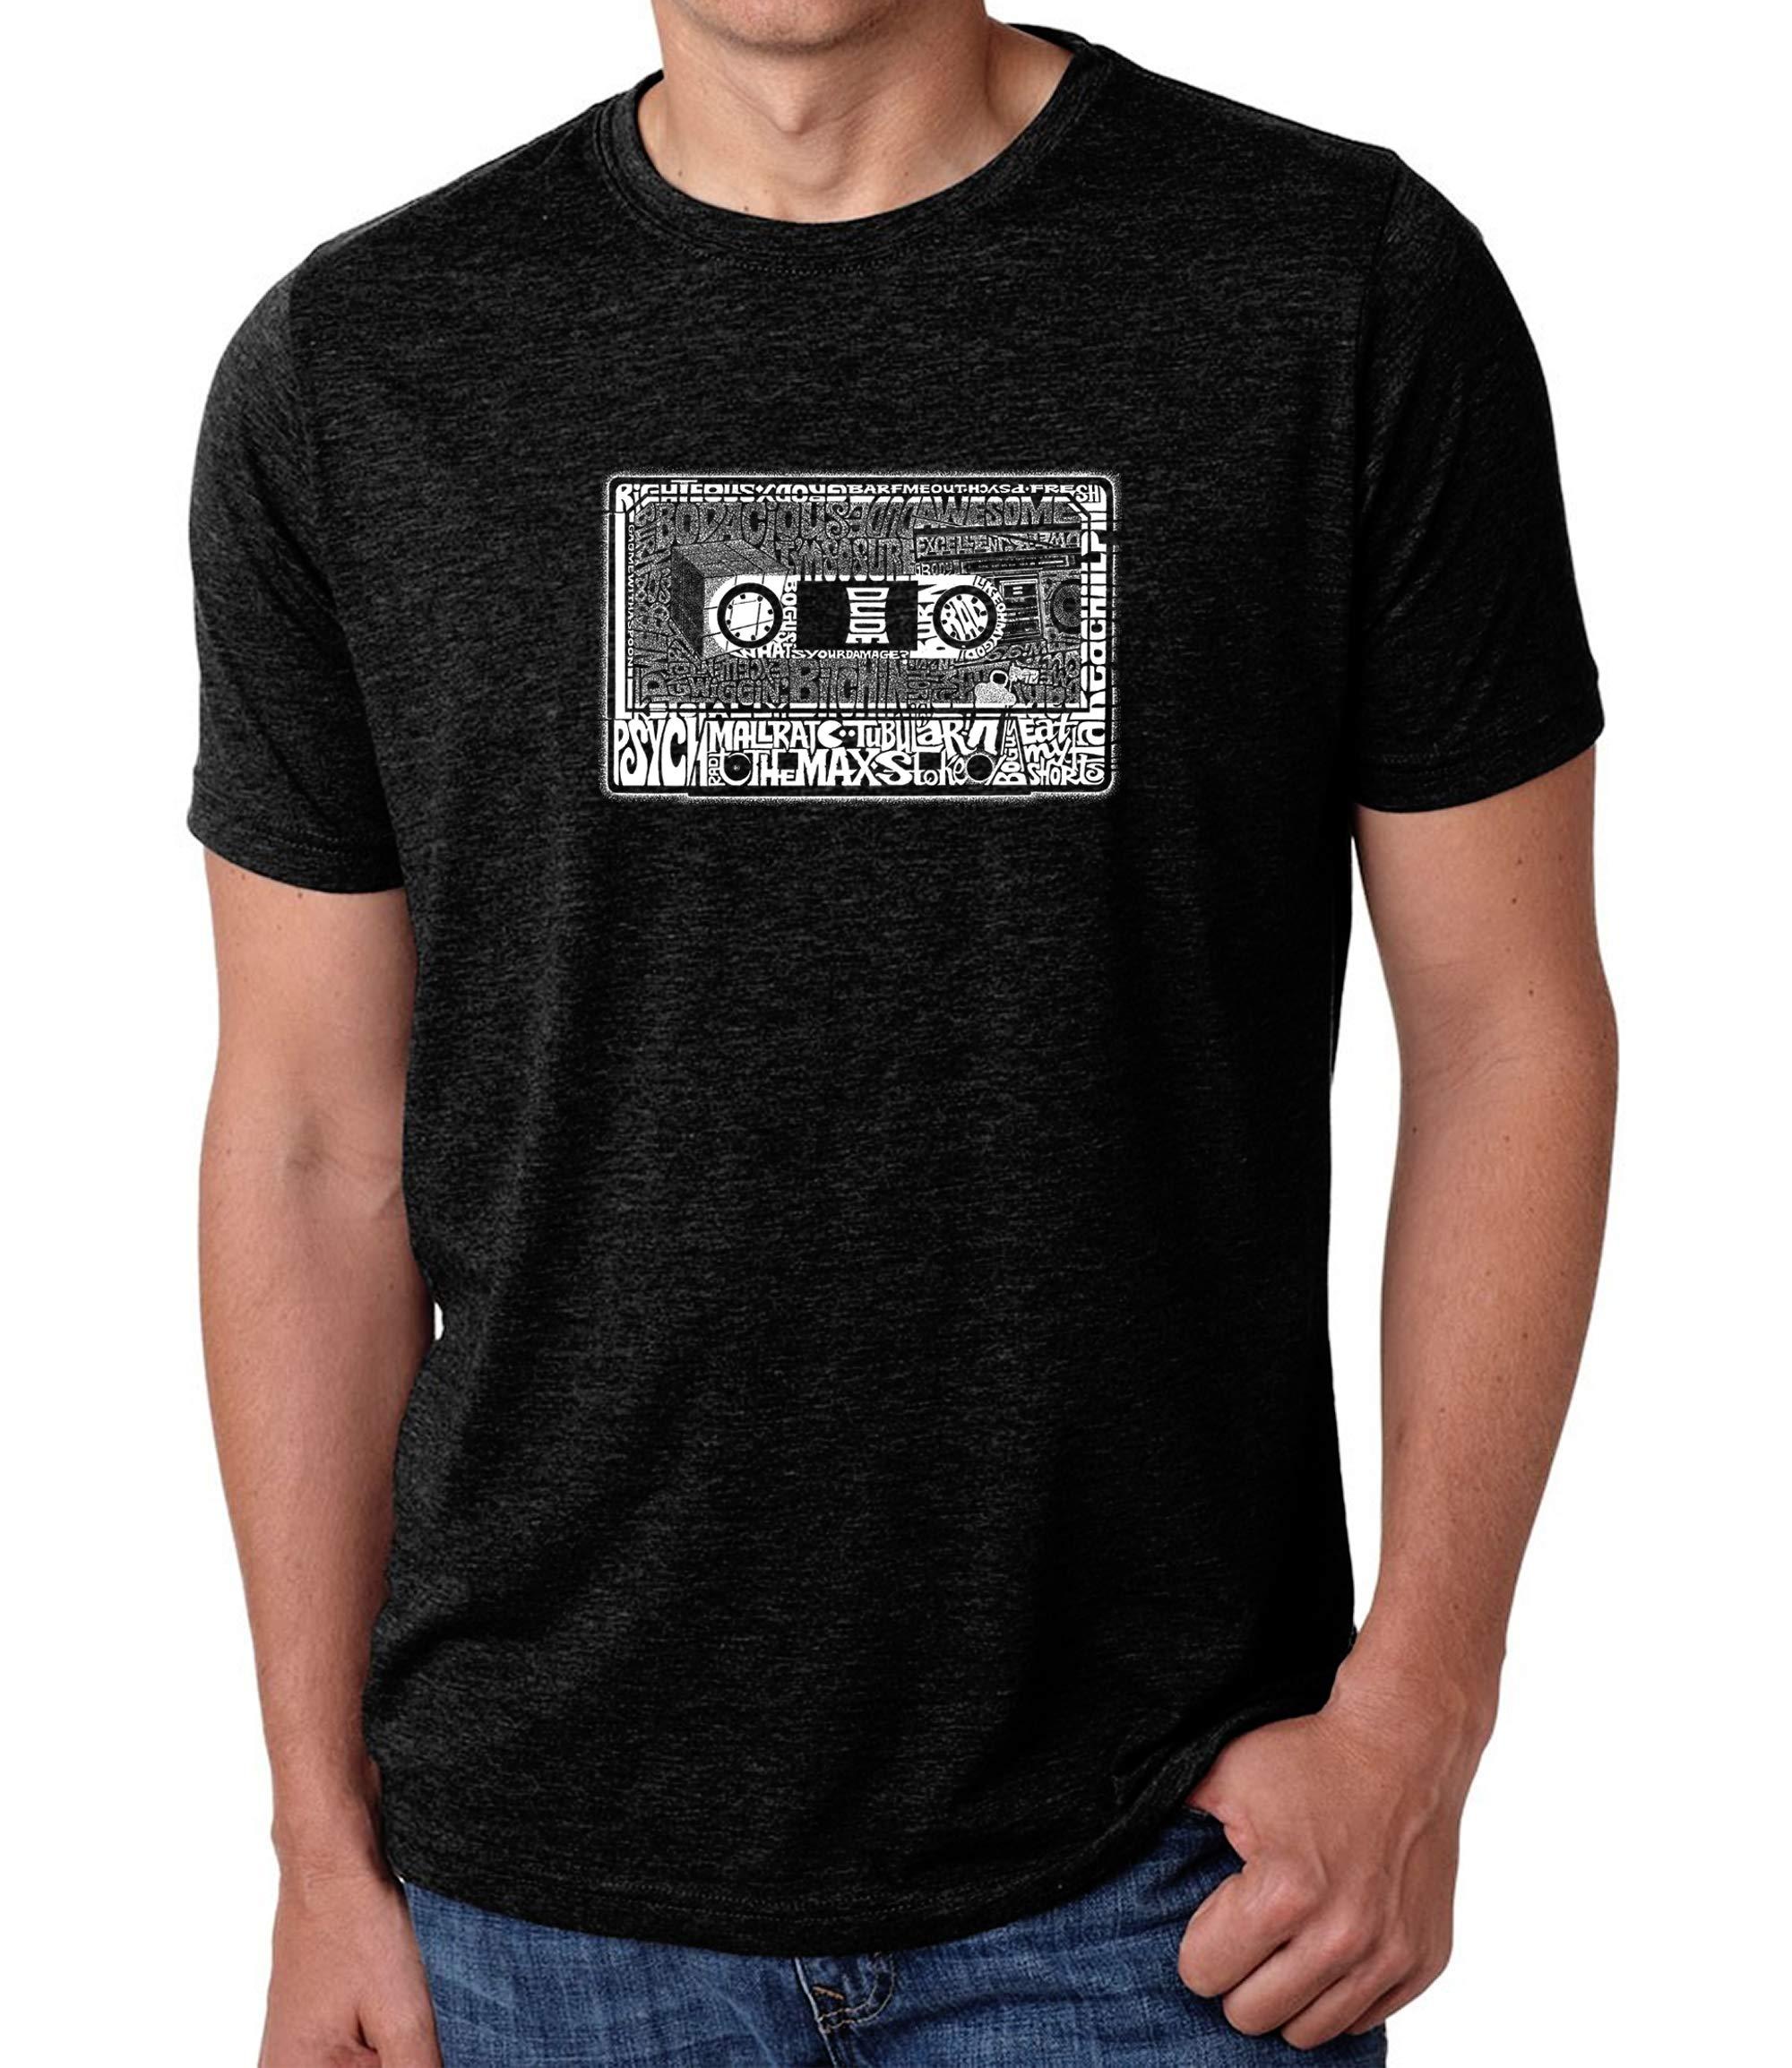 LA Pop Art Men's Premium Blend Word Art T-Shirt - The 80's